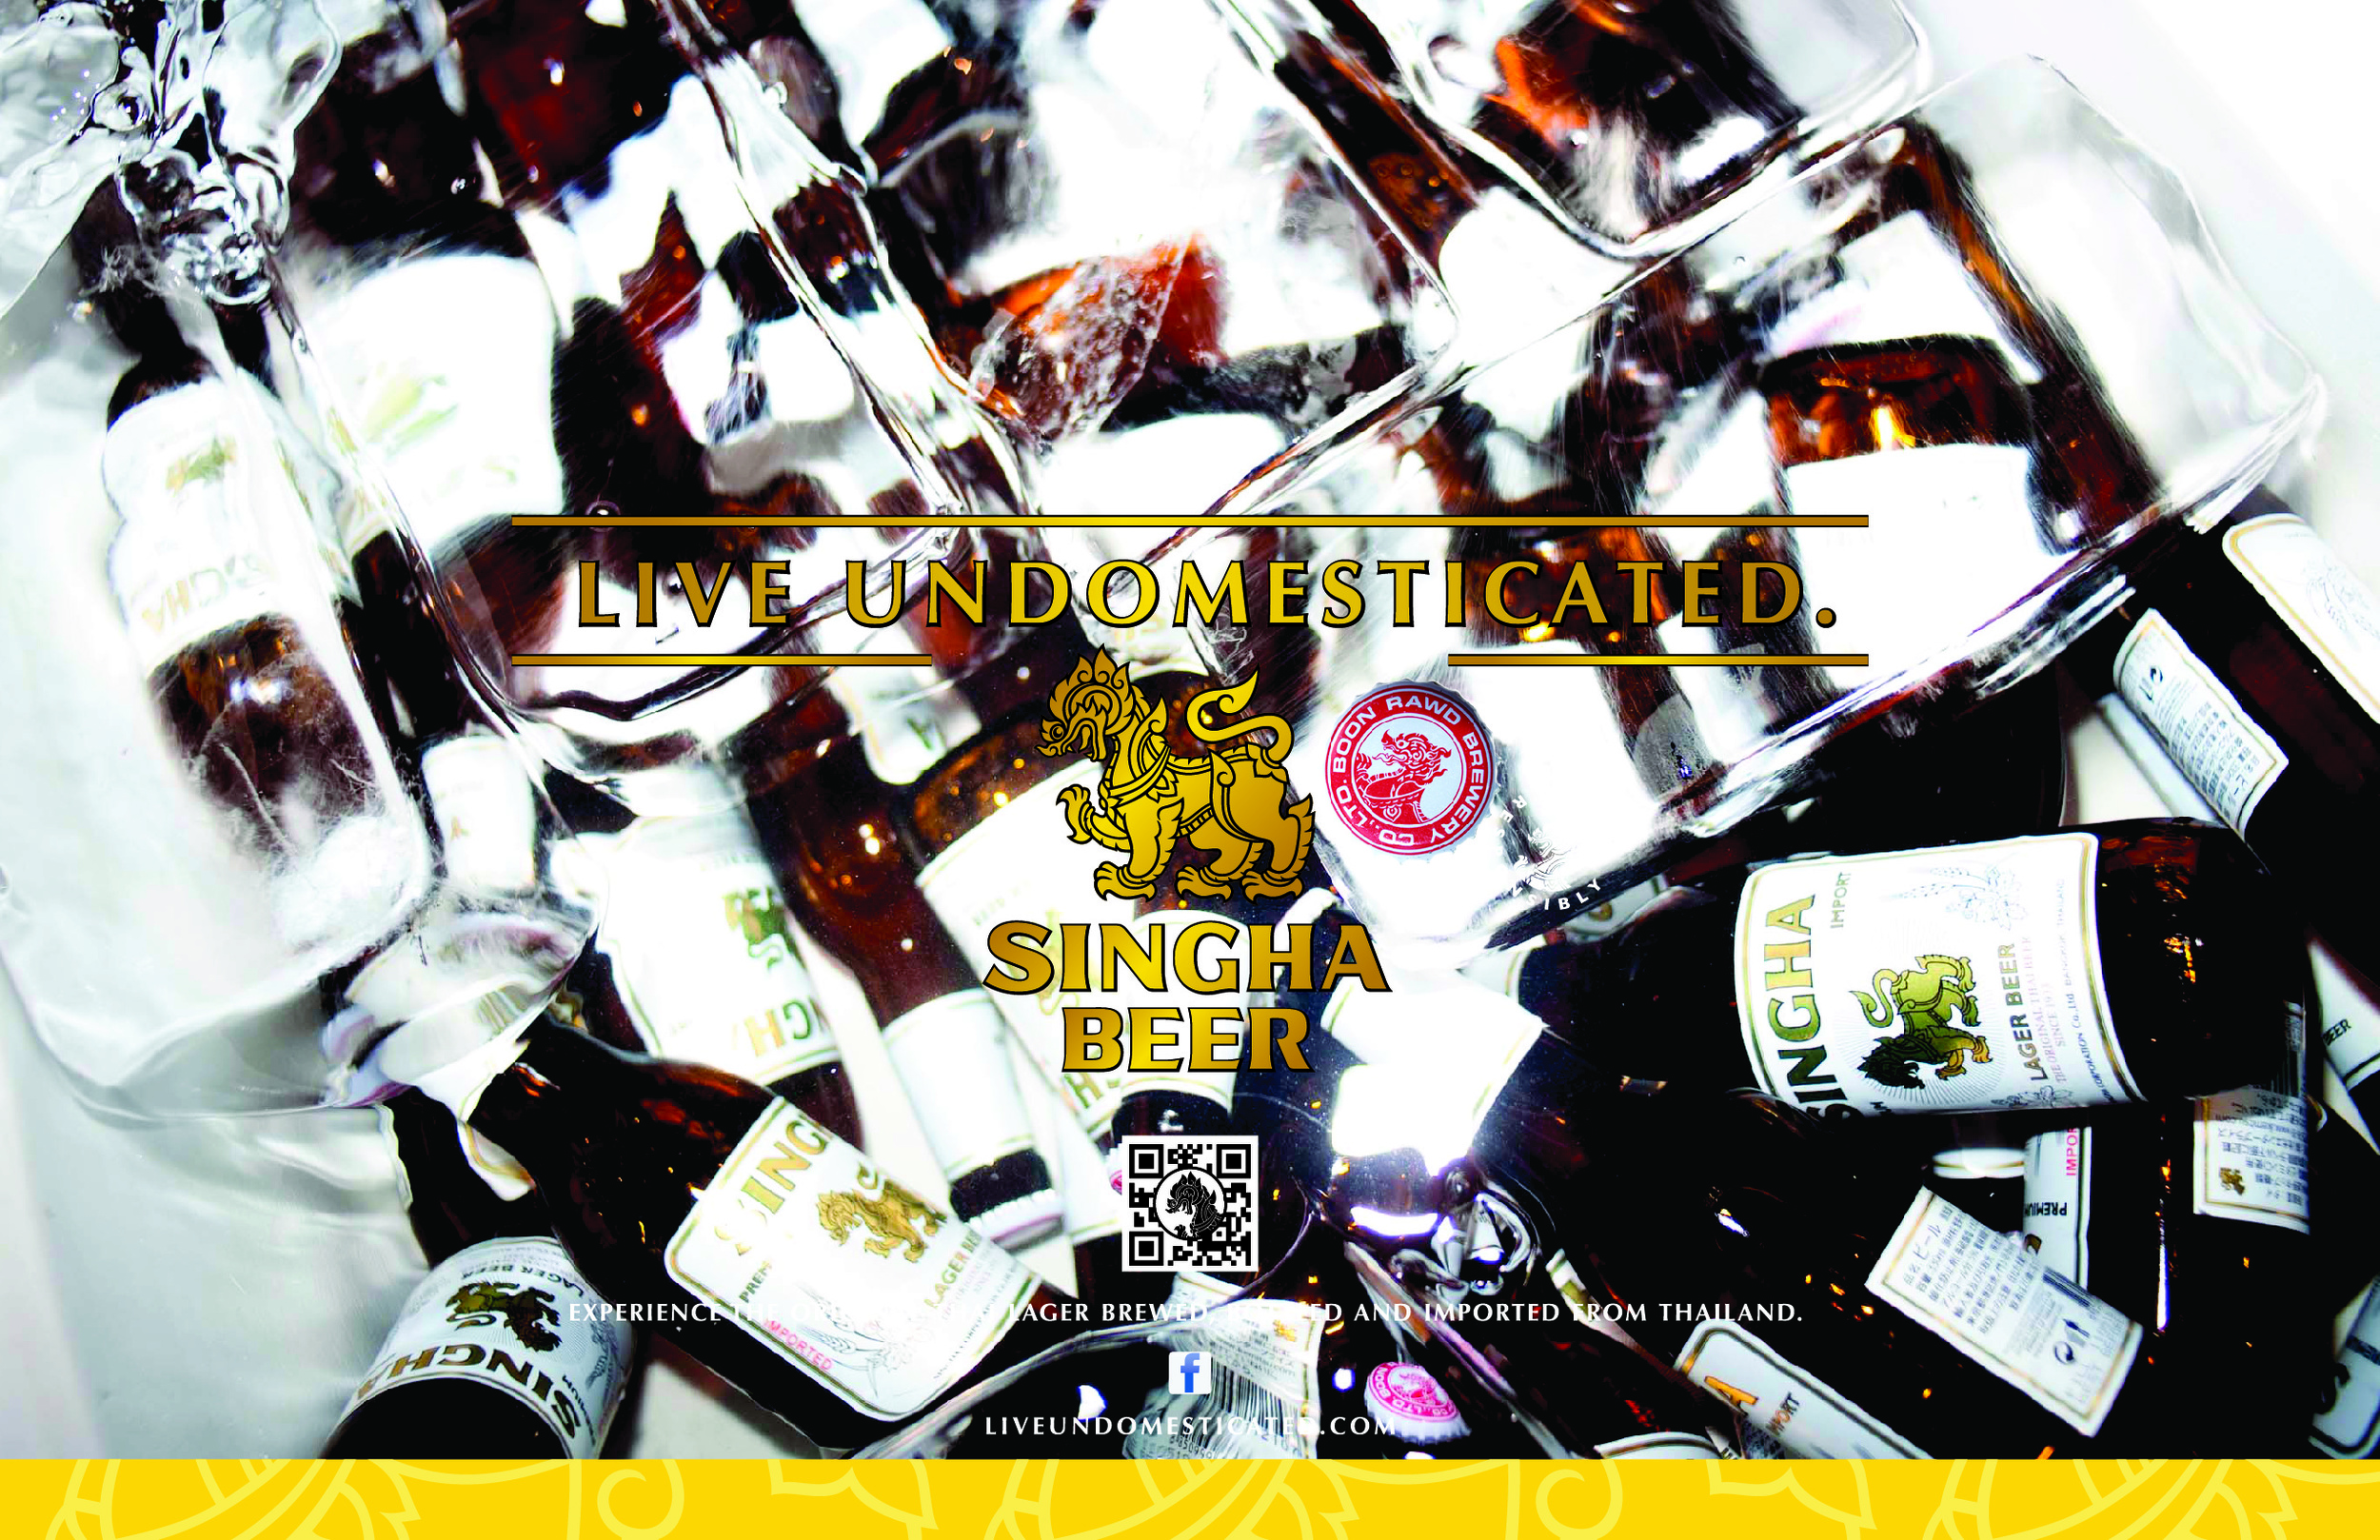 GERTRUDE_SINGHA BEER_LIVE UNDOMESTICATED_PRINT AD_SPREAD02.jpg